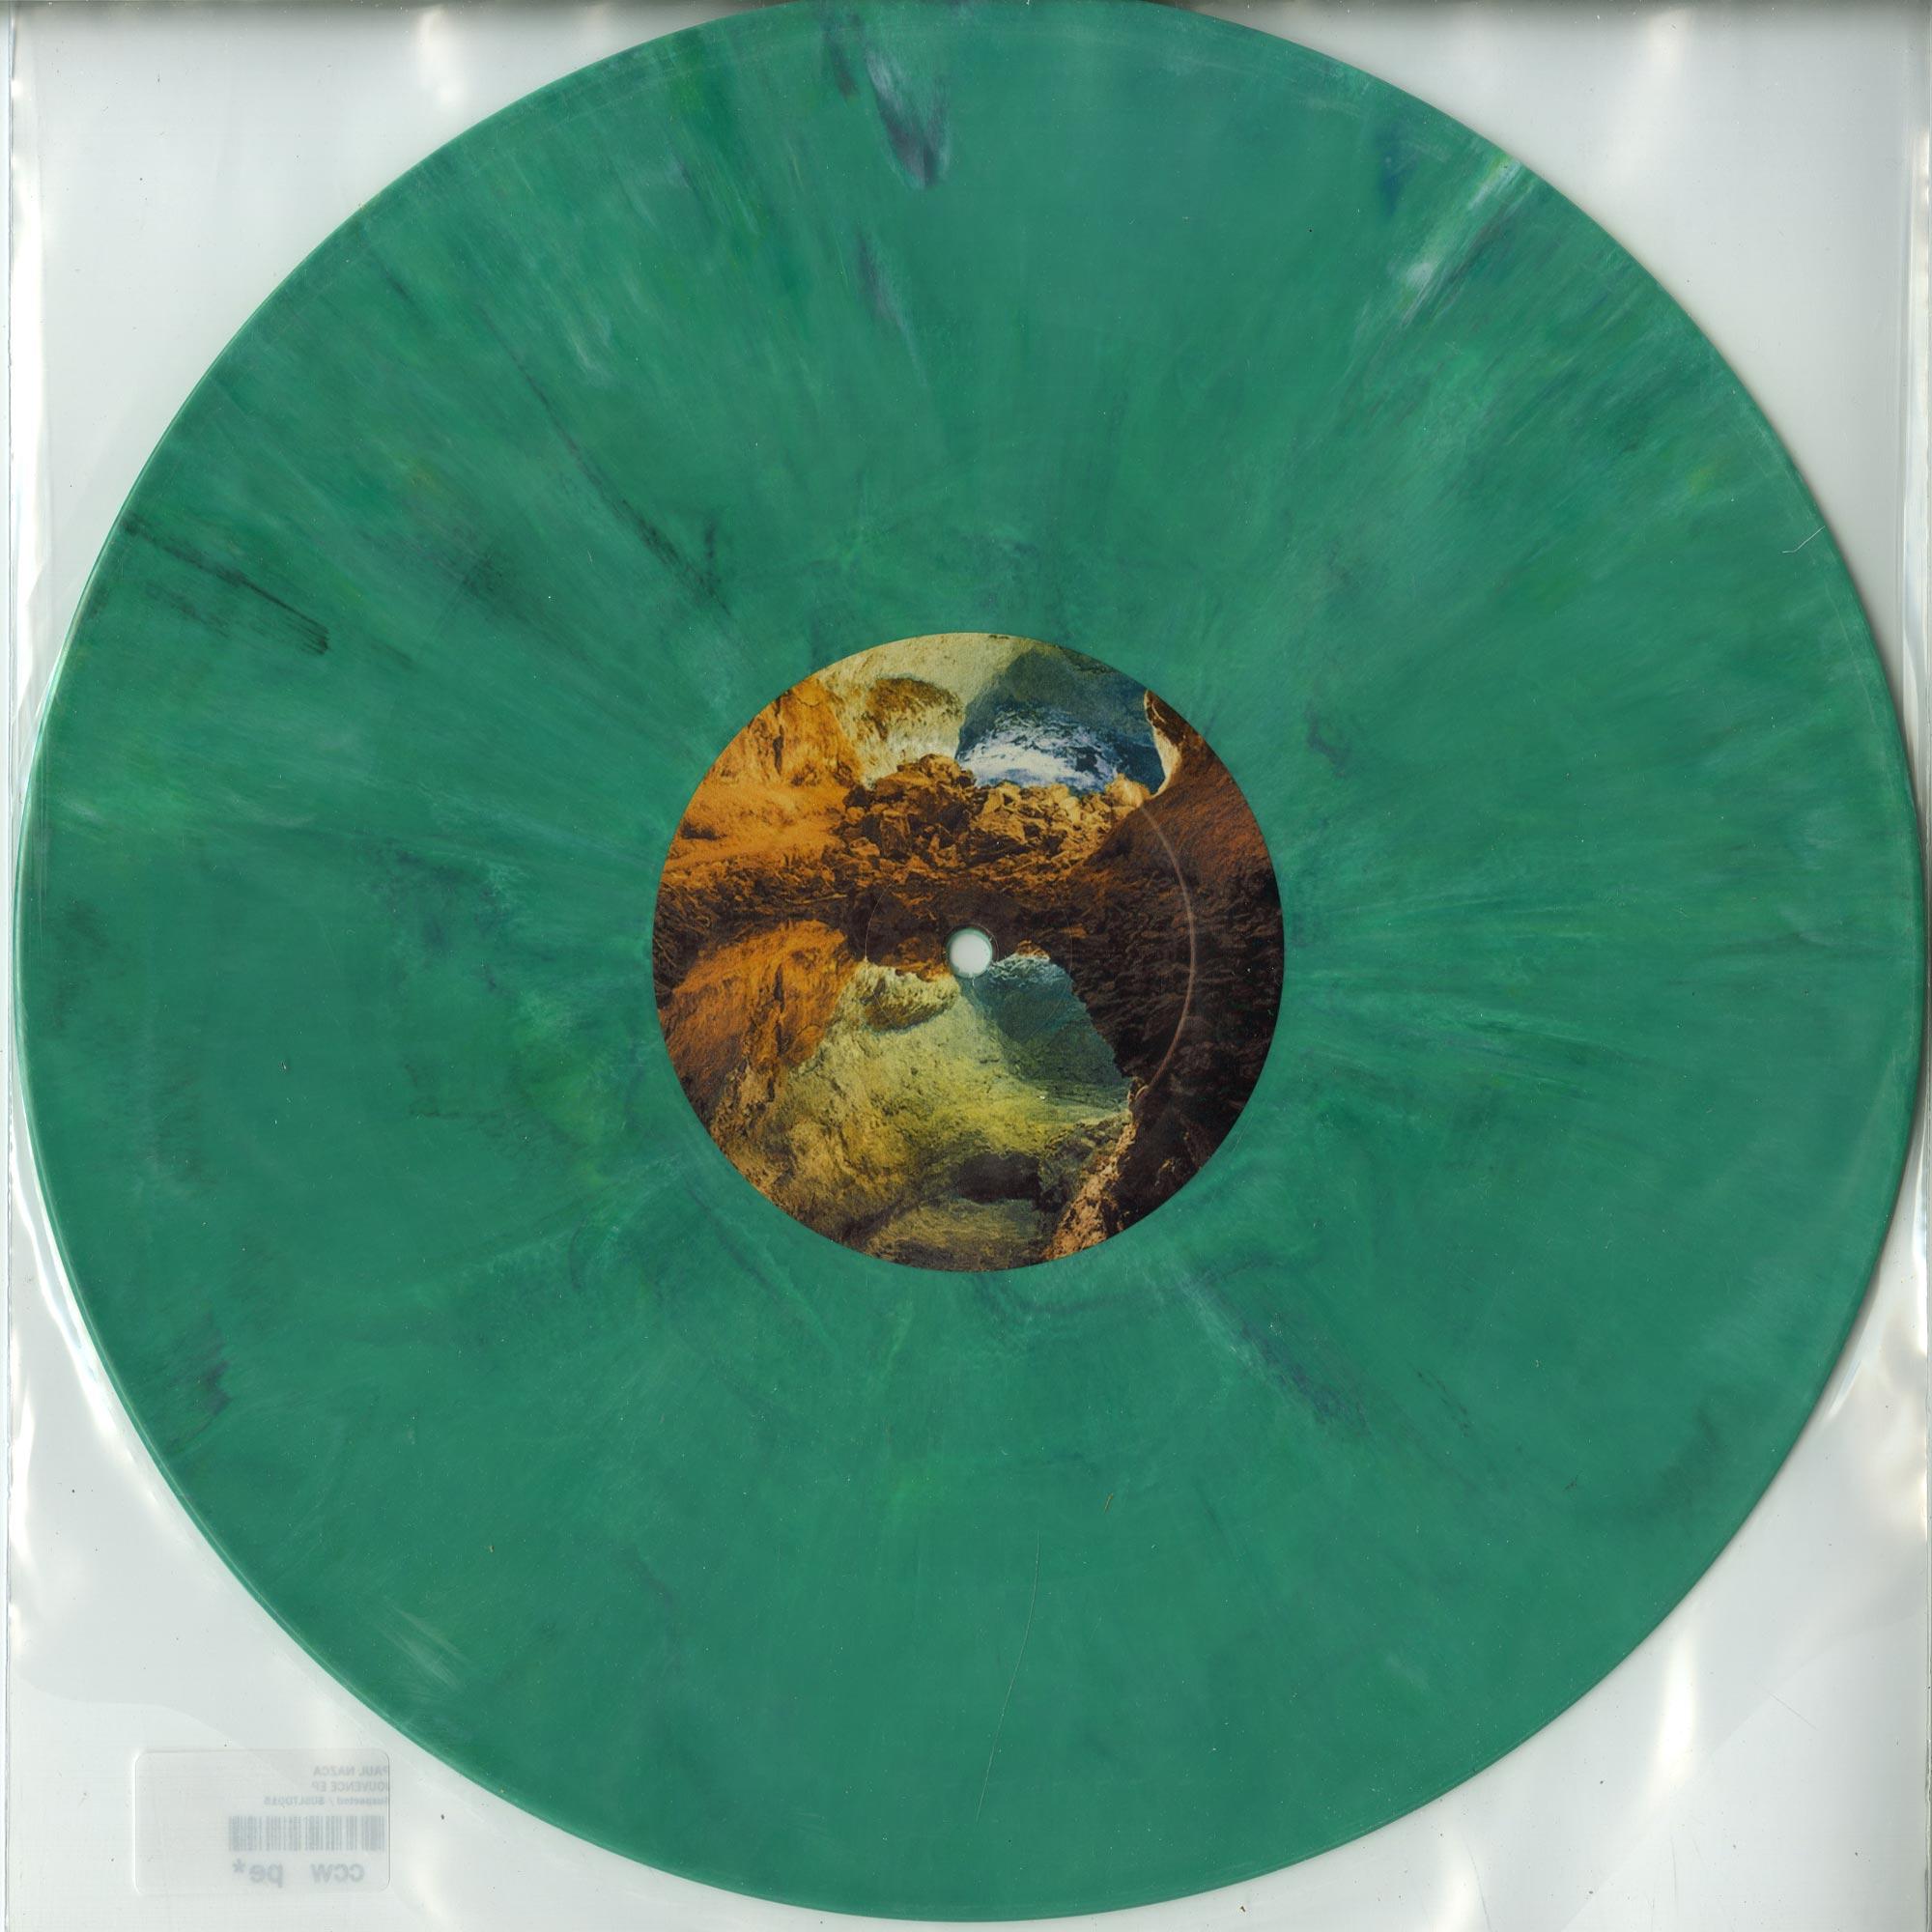 Paul Nazca - JOUVENCE EP